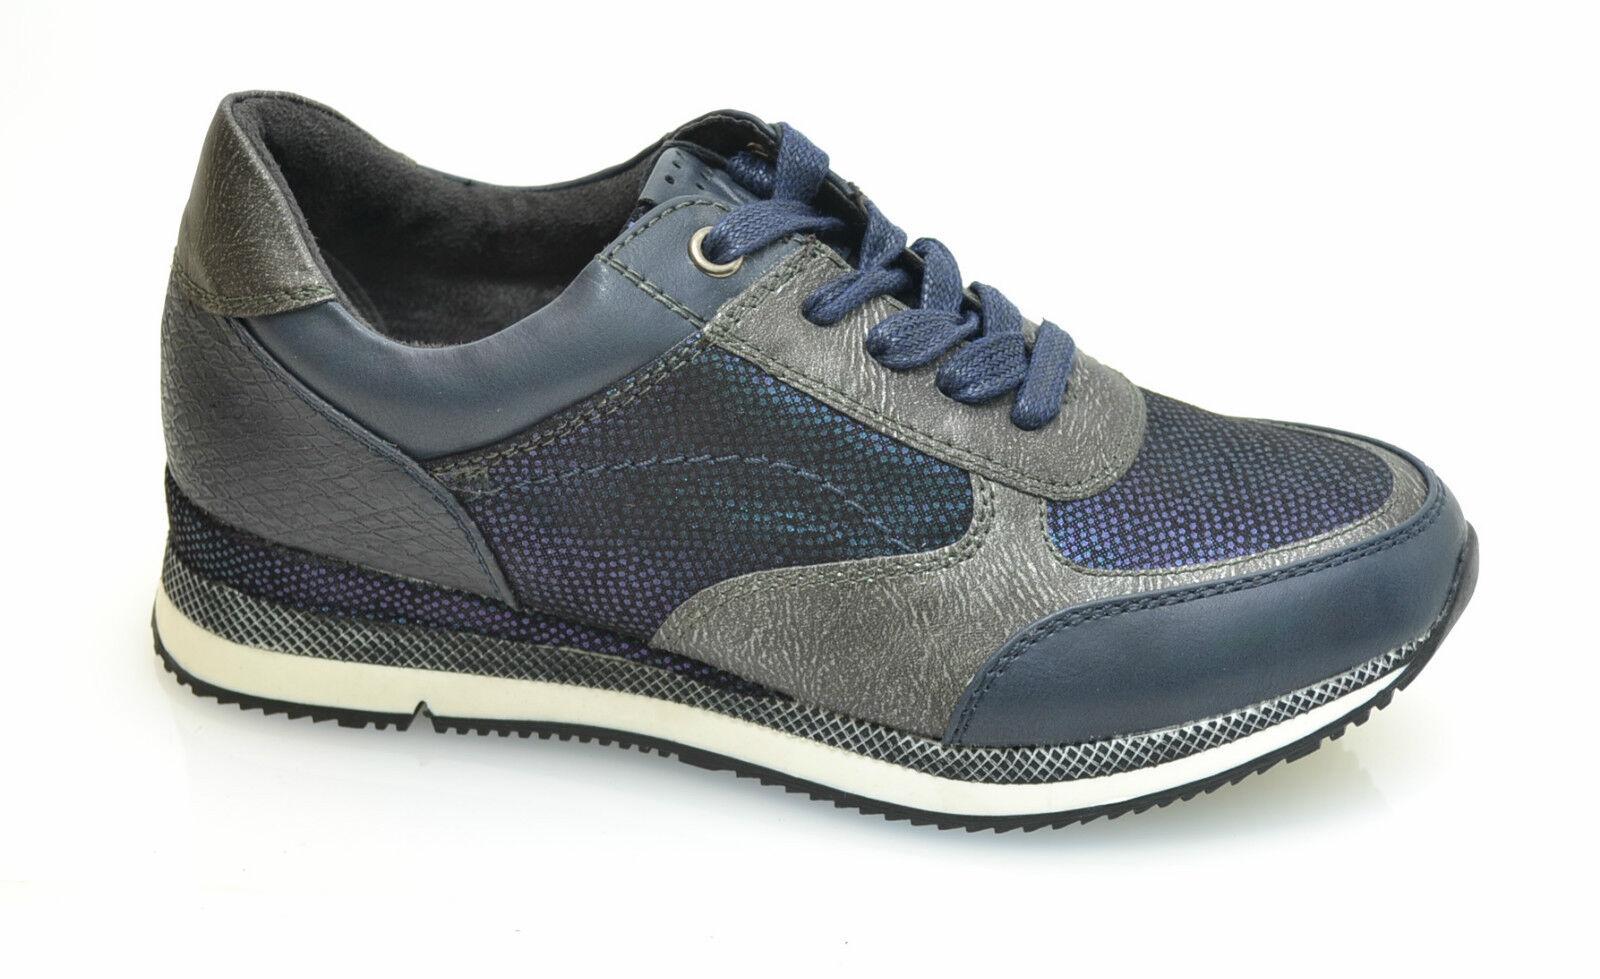 MARCO TOZZI 23710 Damen Schuhe Sneaker blau navy  NEU 36 - 42